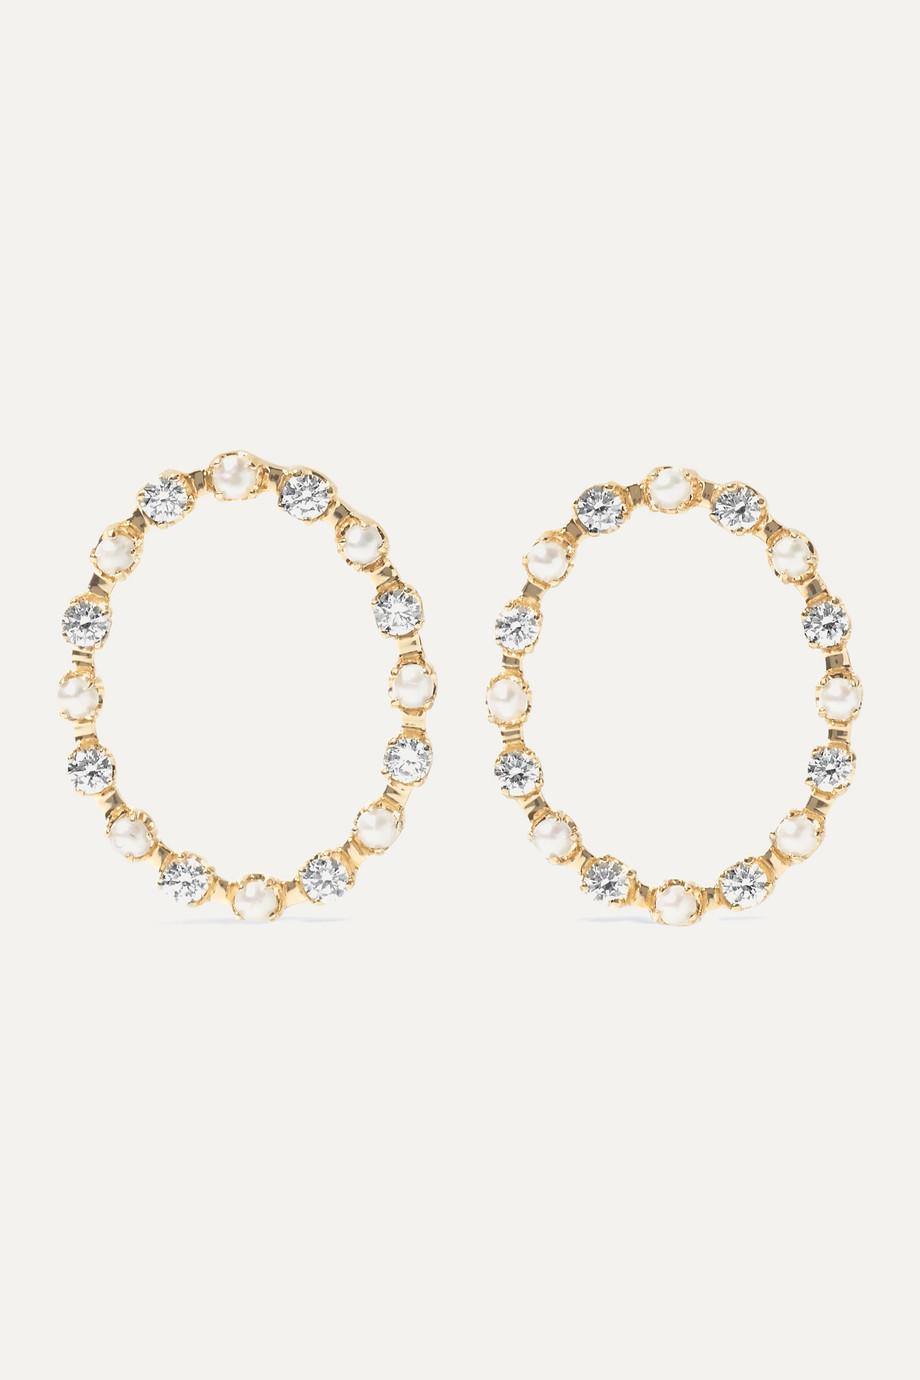 Marlo Laz Full Circle 14-karat gold, diamond and pearl earrings